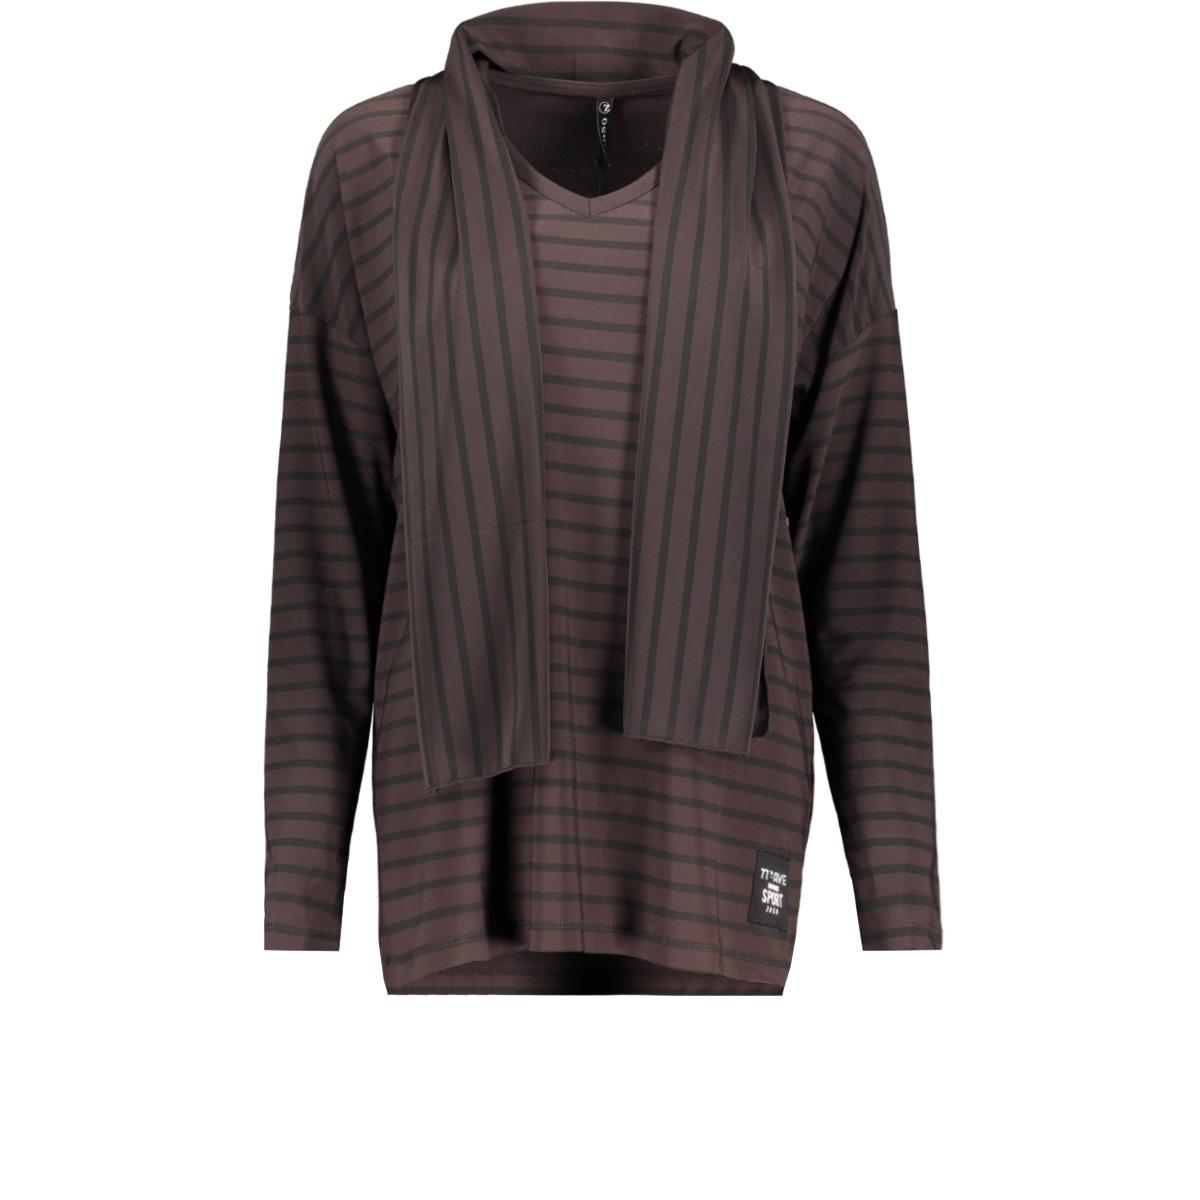 perry splendour fabric shirt zoso t-shirt brown/black